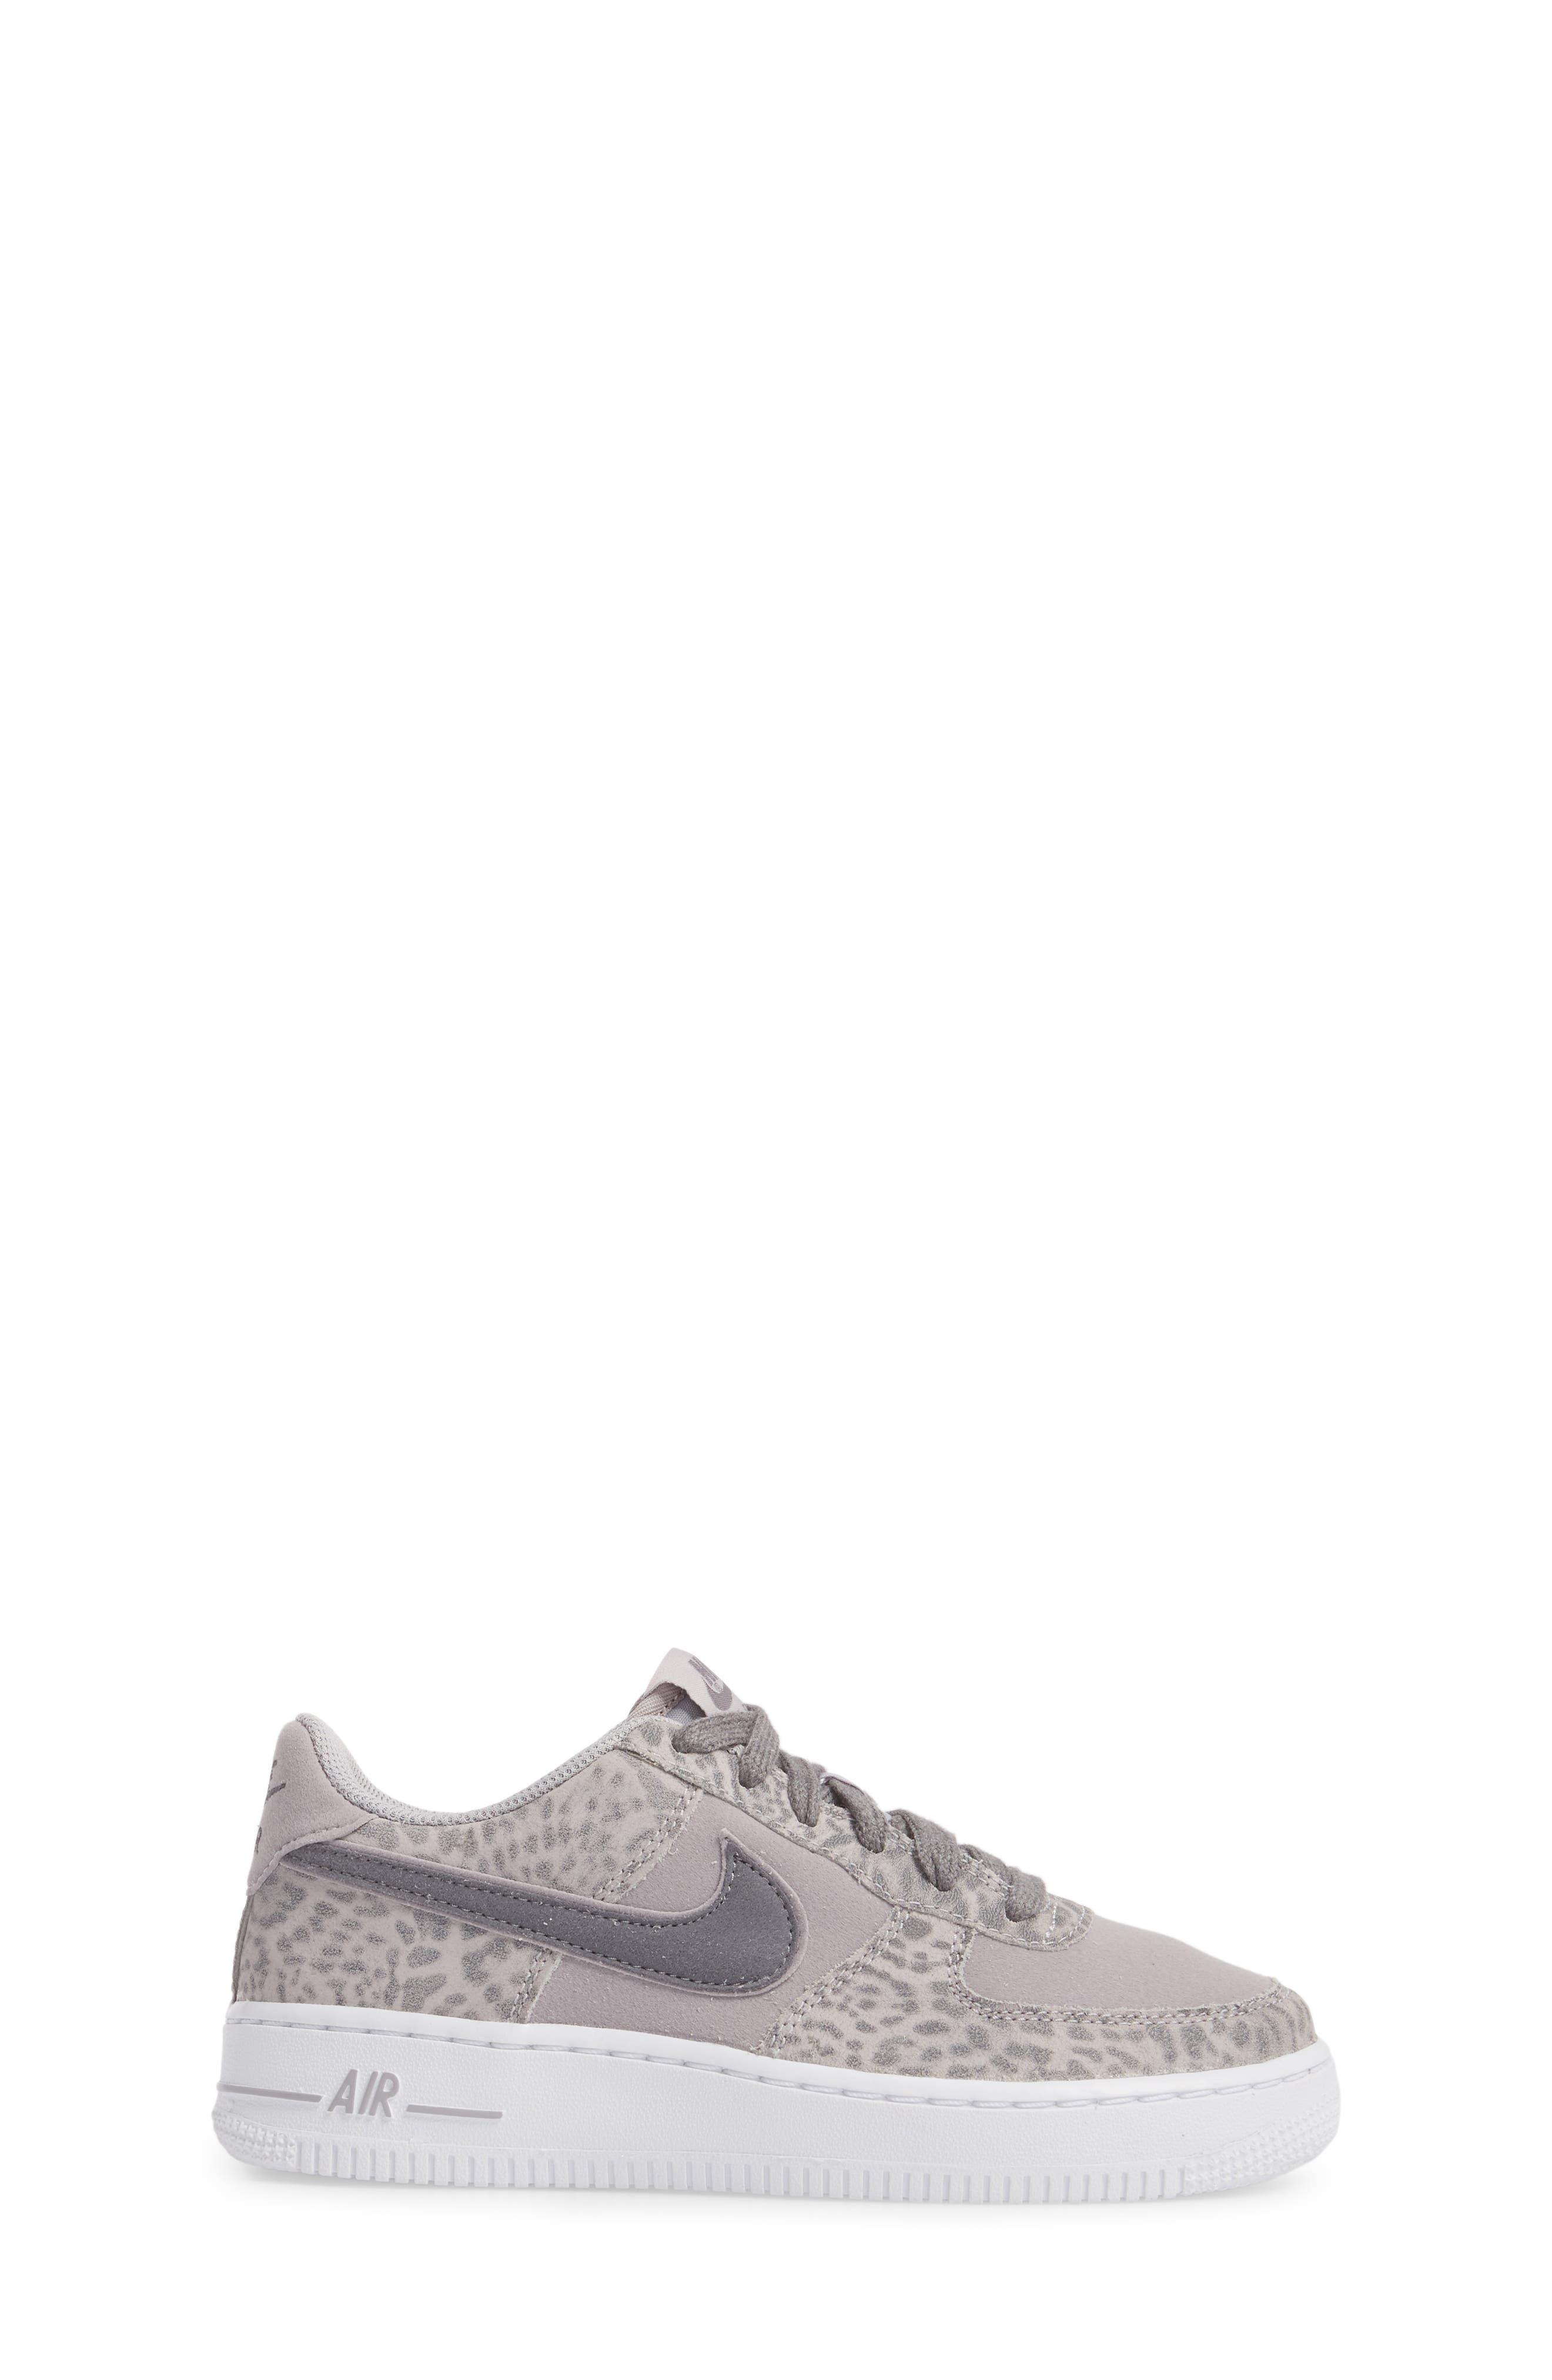 Air Force 1 LV8 Sneaker,                             Alternate thumbnail 3, color,                             020